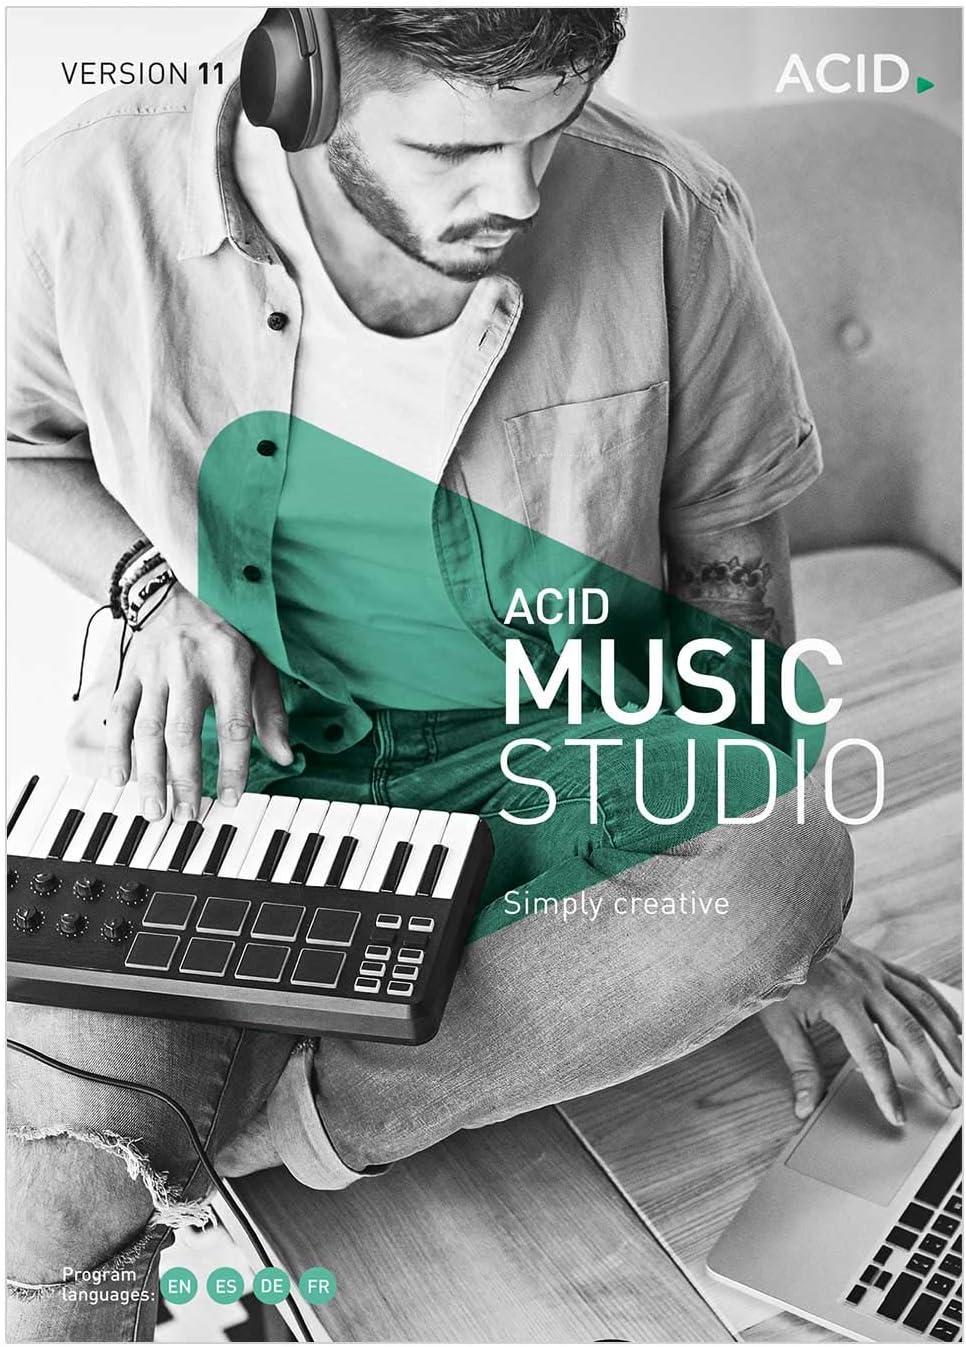 ACID Music Studio - Version 11 [PC Download]